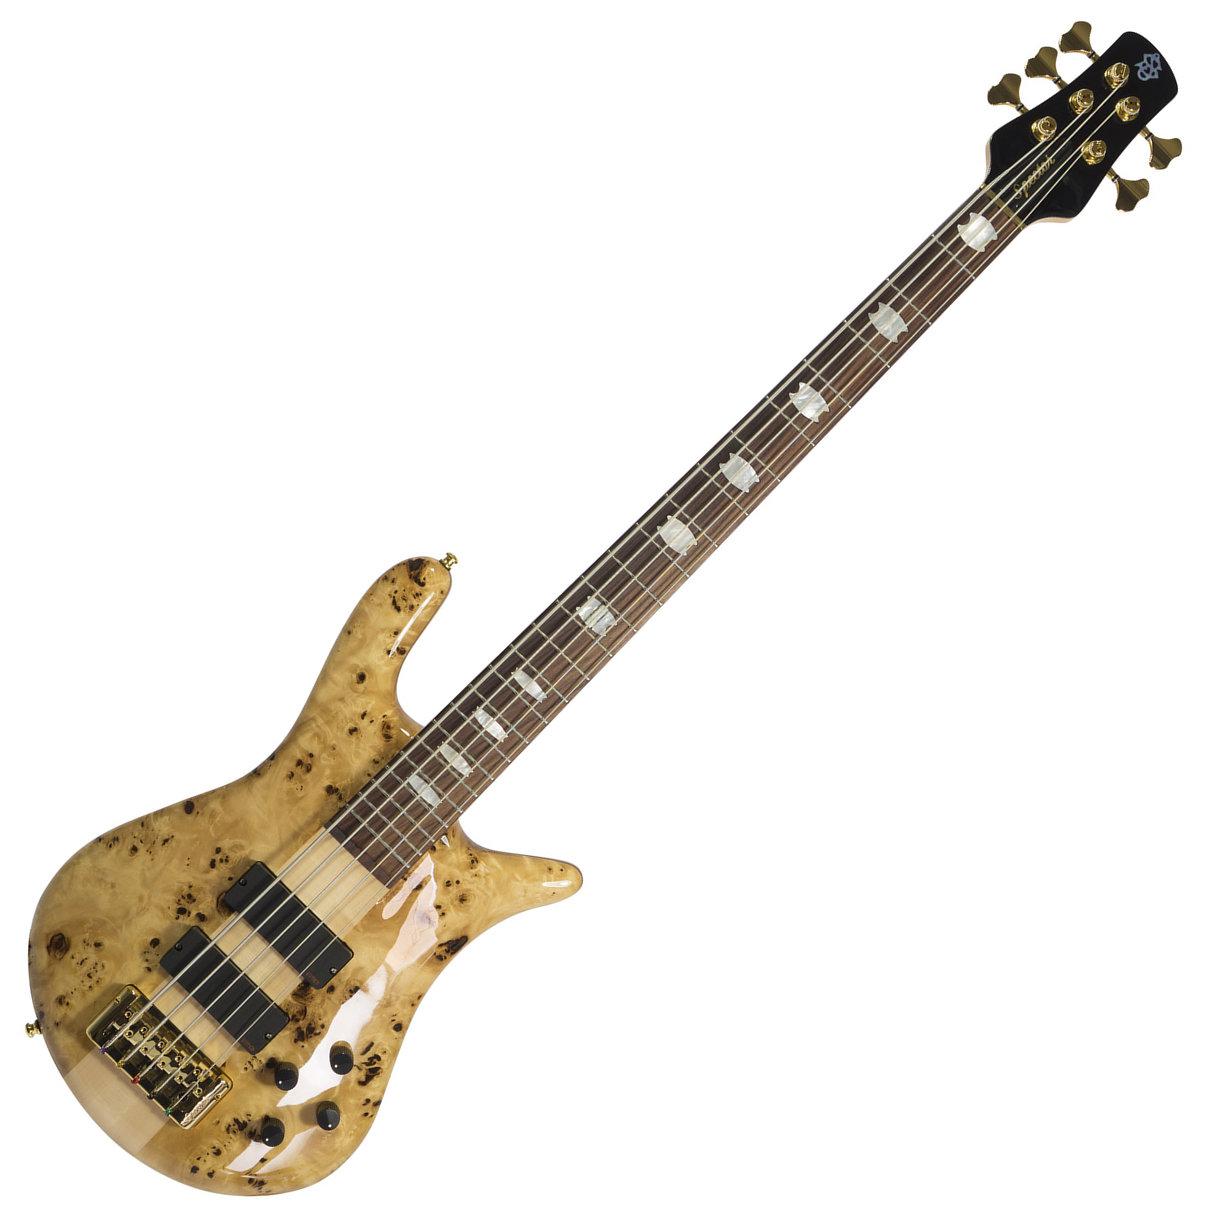 spector-euro-5lx-poplar-burl-gloss-bass-1